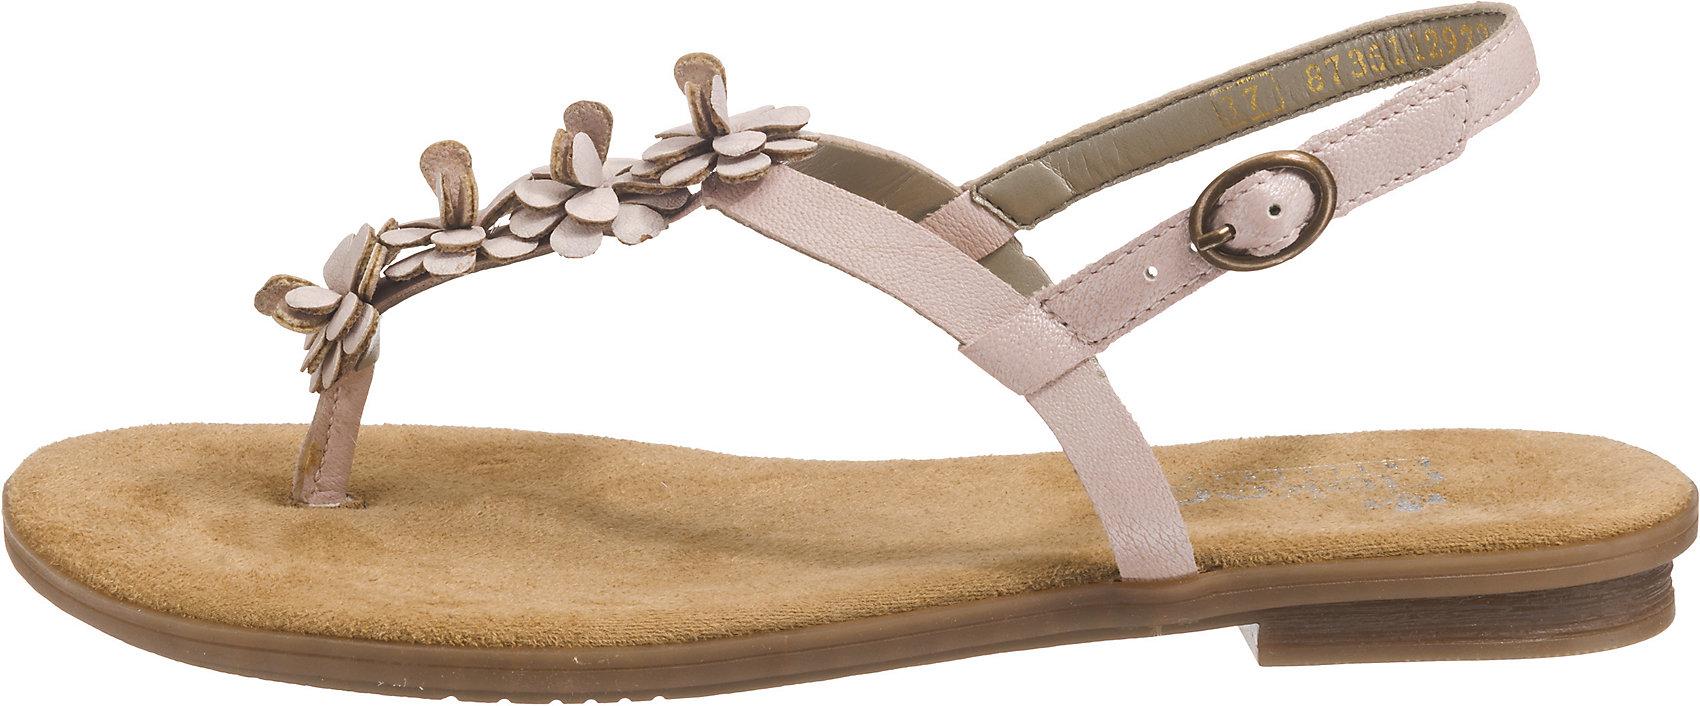 Neu rieker Klassische Sandalen 7568820 für Damen rosa